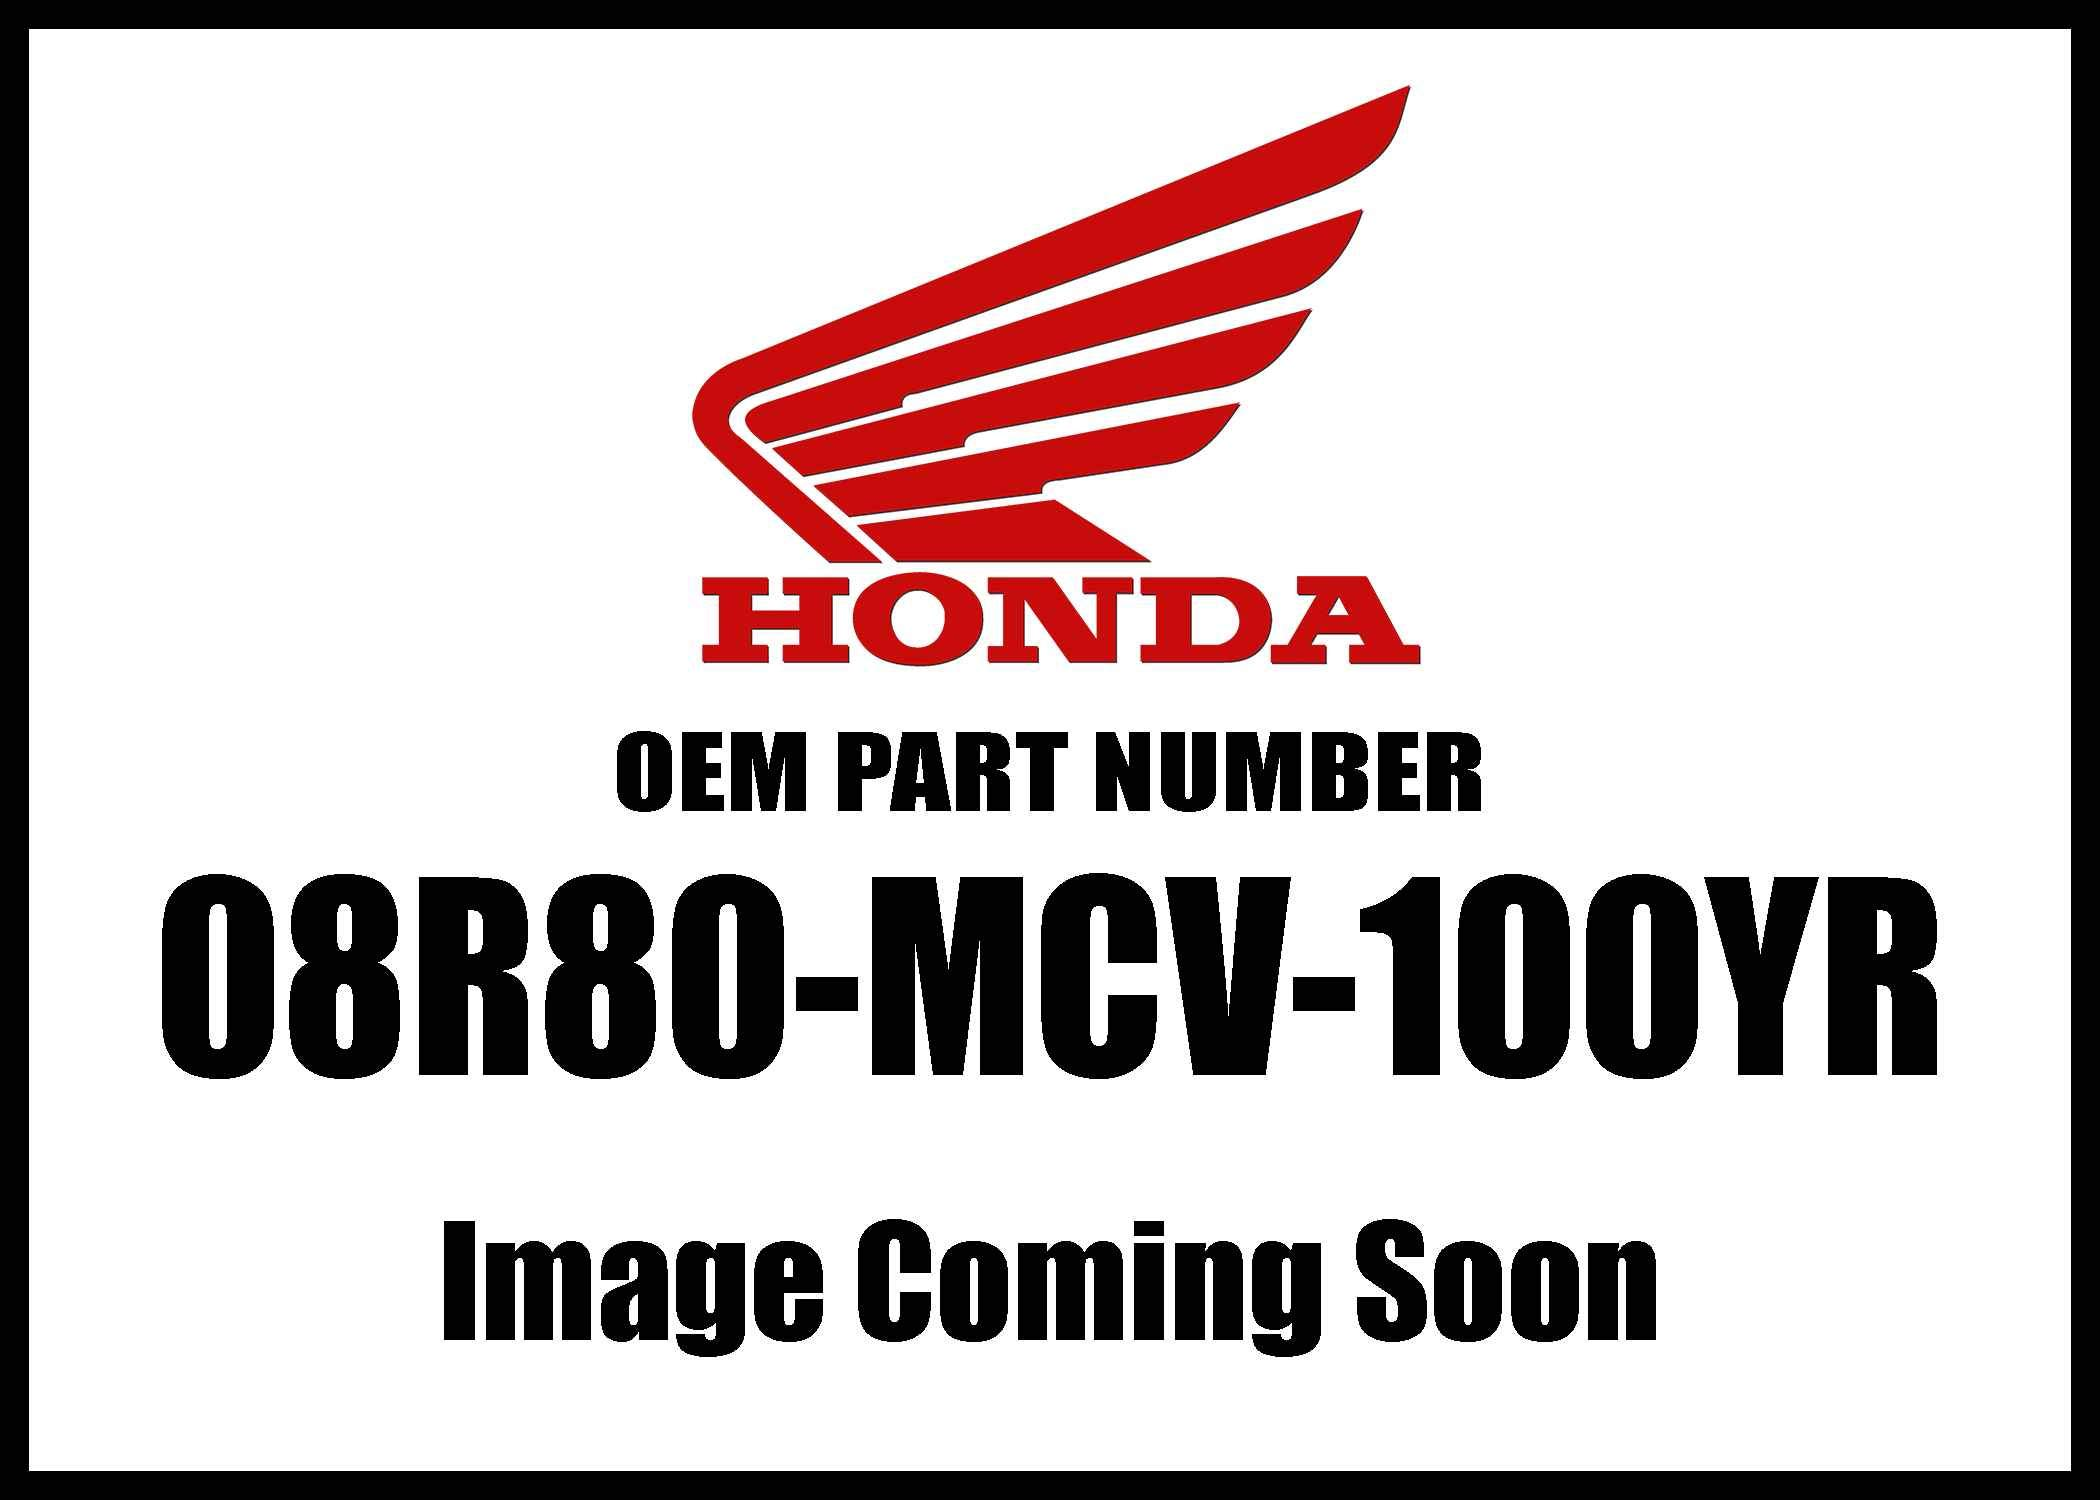 Honda Vtx1300 Screw 6X22 Sub Kit 08R80-Mcv-100Yr New Oem